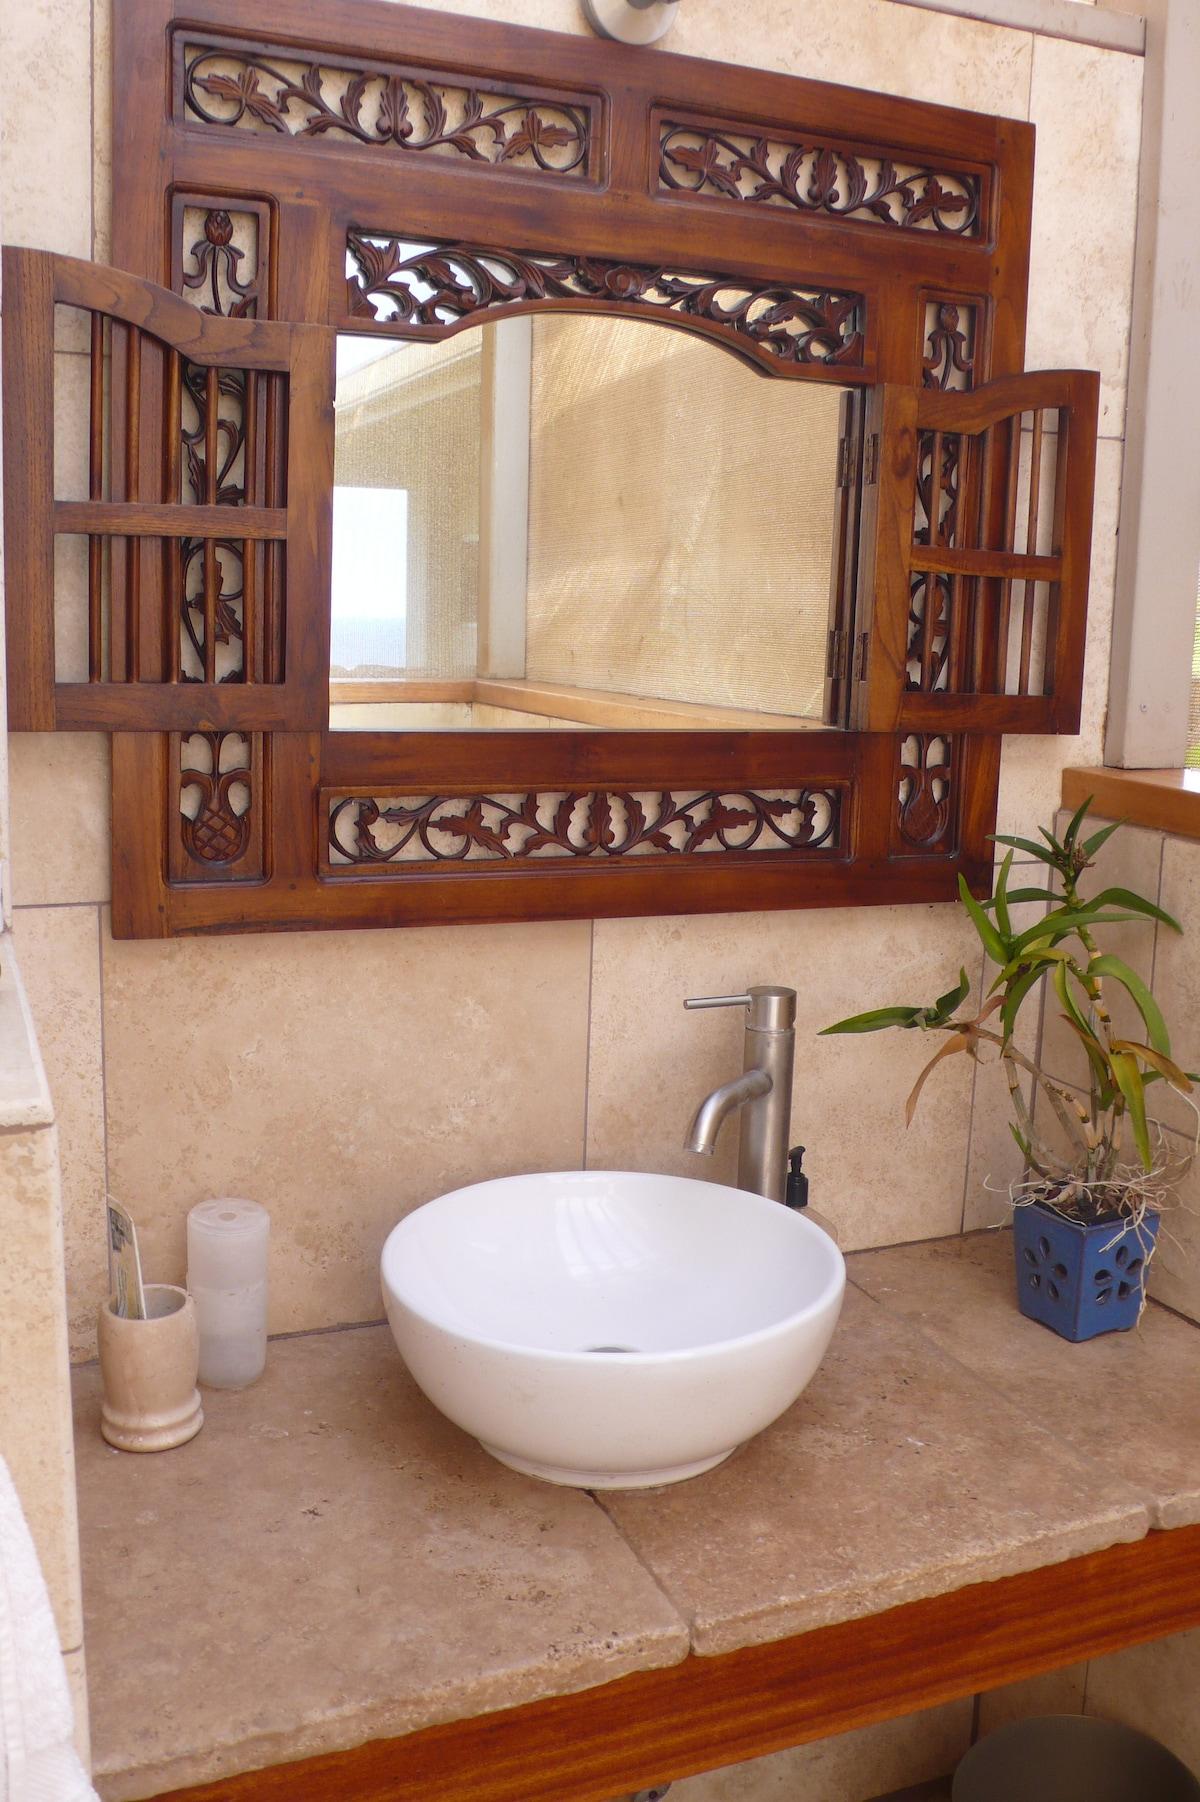 Private travertine bathroom vanity